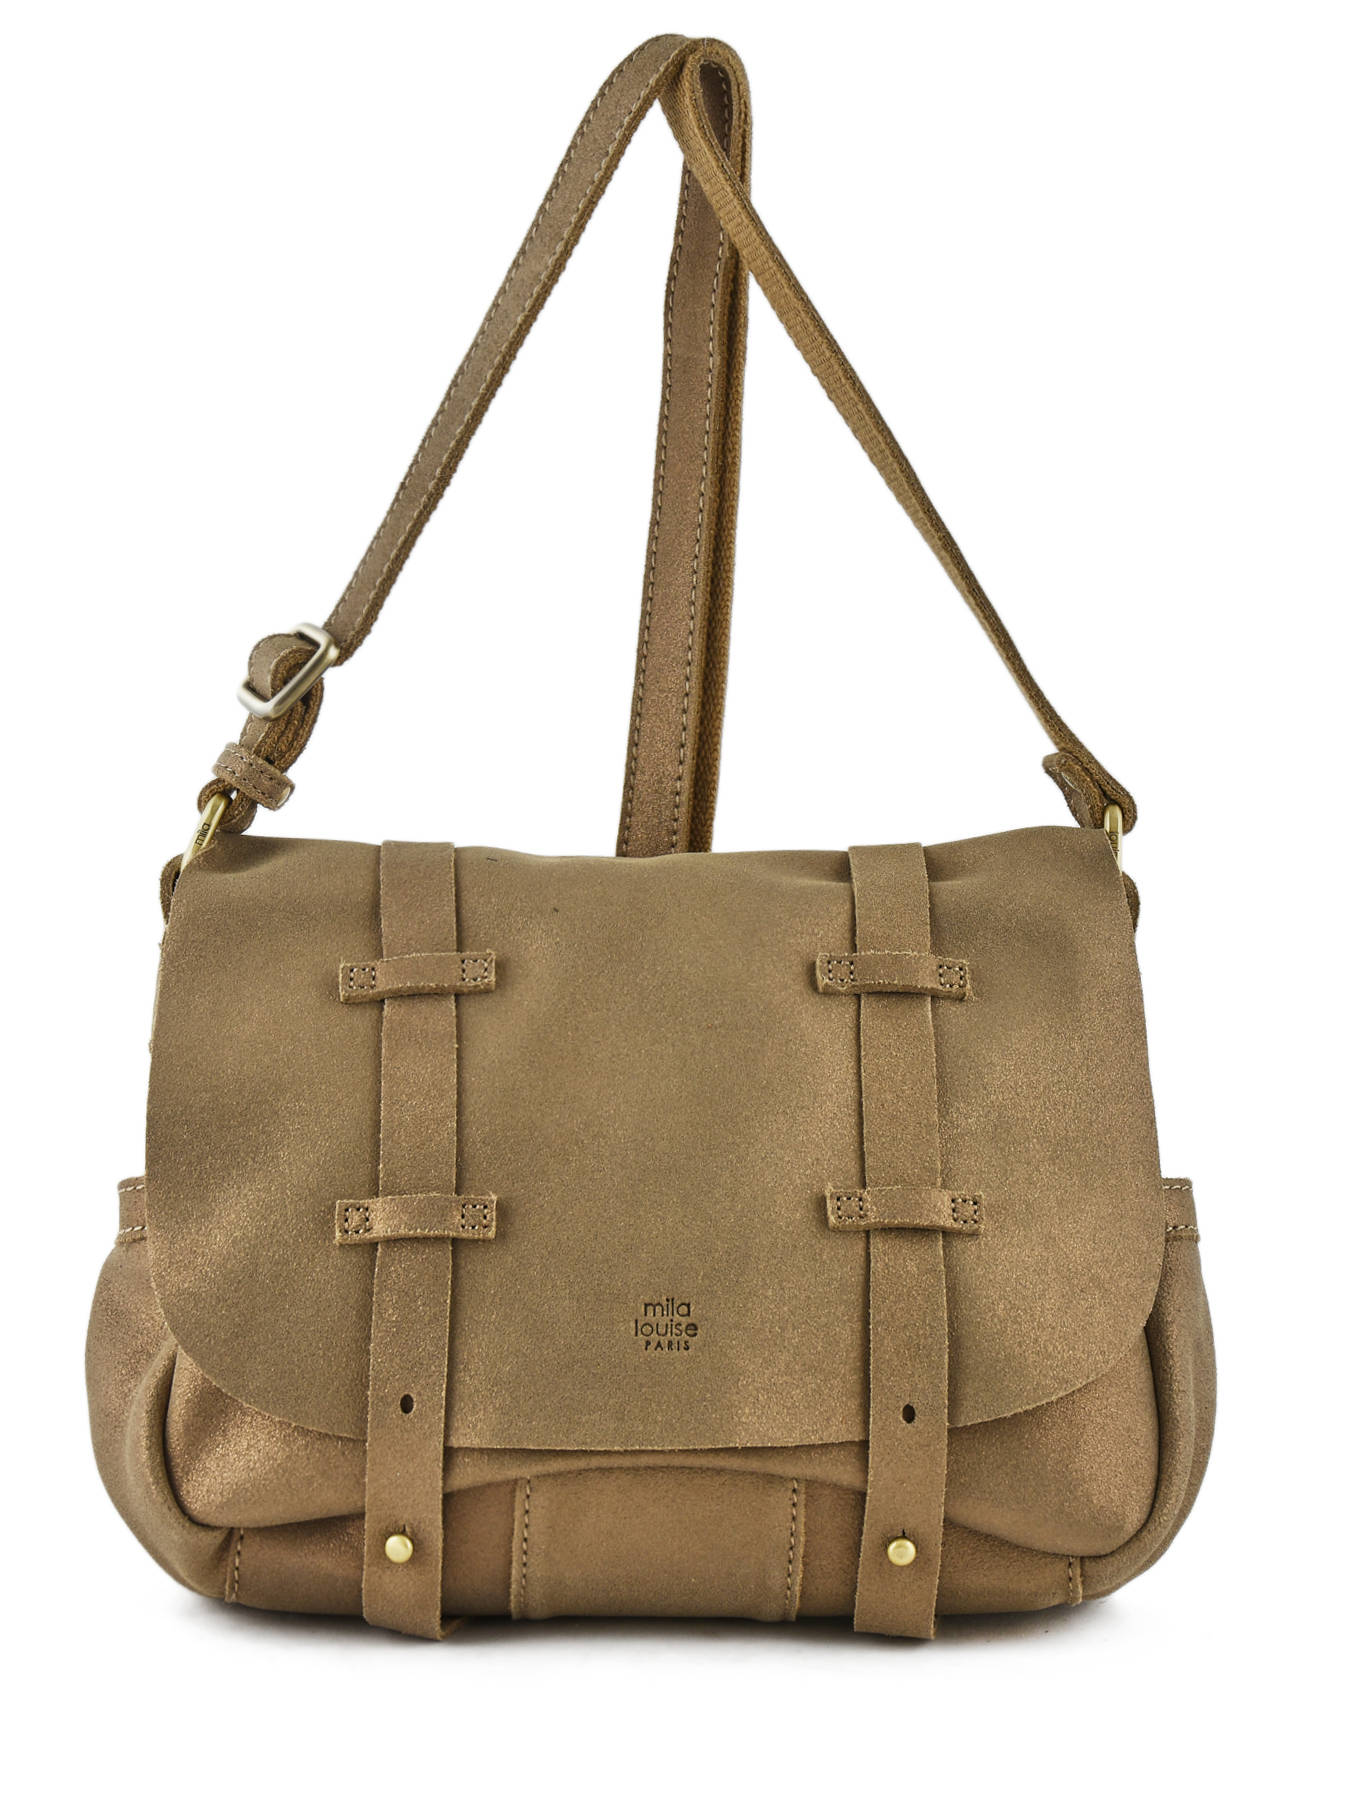 1881fbc193e1 ... Shoulder Bag Vintage Leather Mila louise Beige vintage 3017S ...